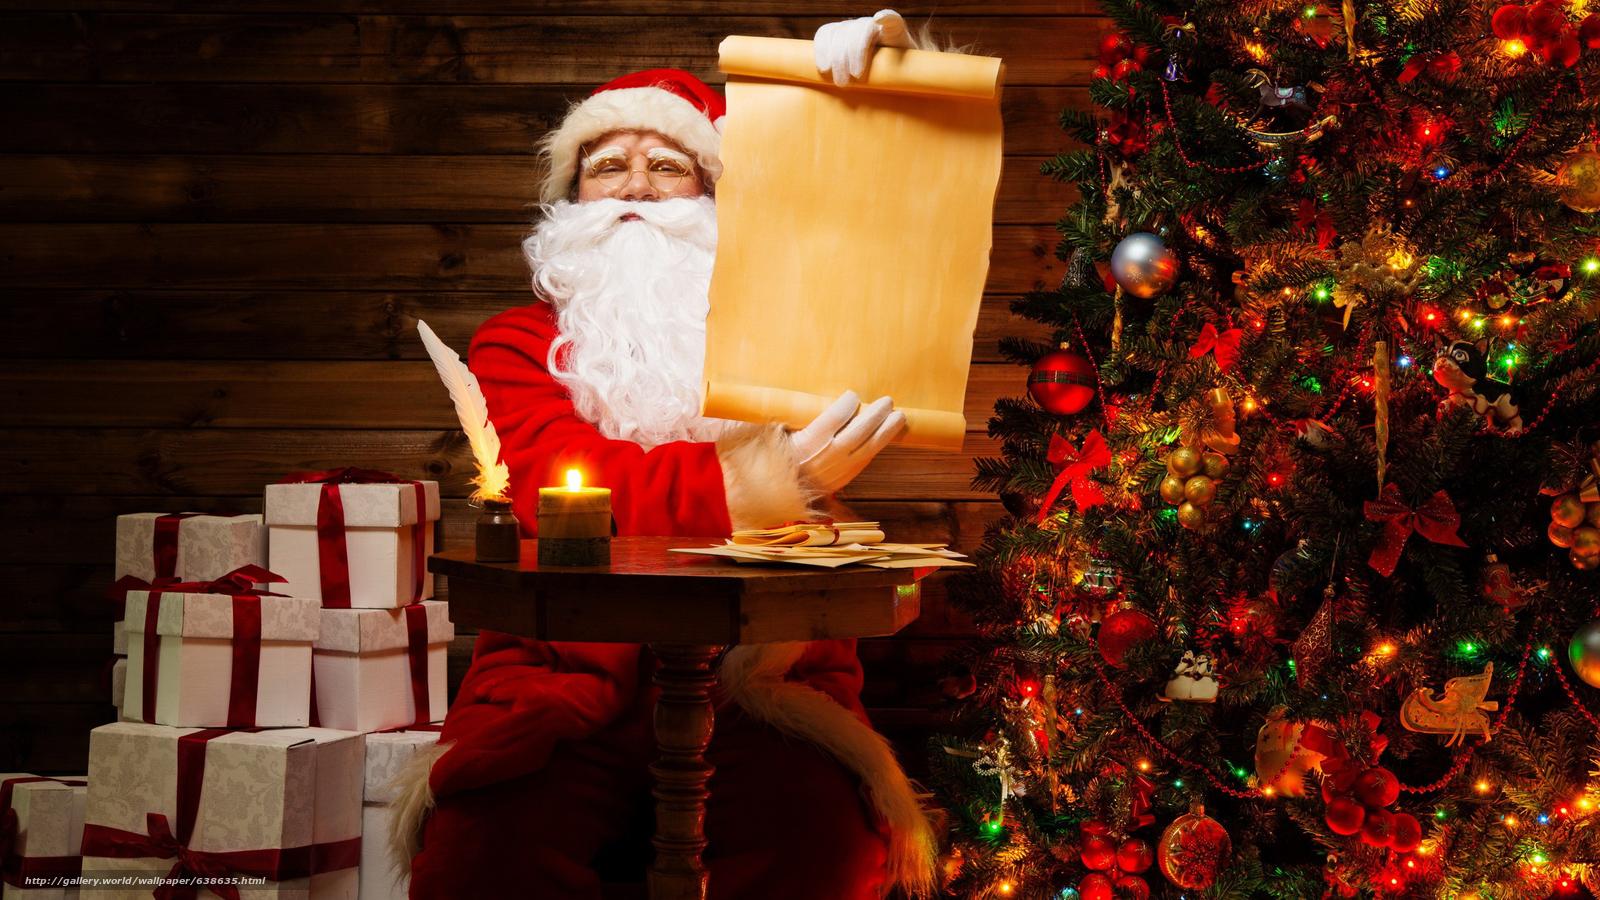 ВЛОГ Новогоднее party 2 елочка Дед Мороз и подарки Видео для 49